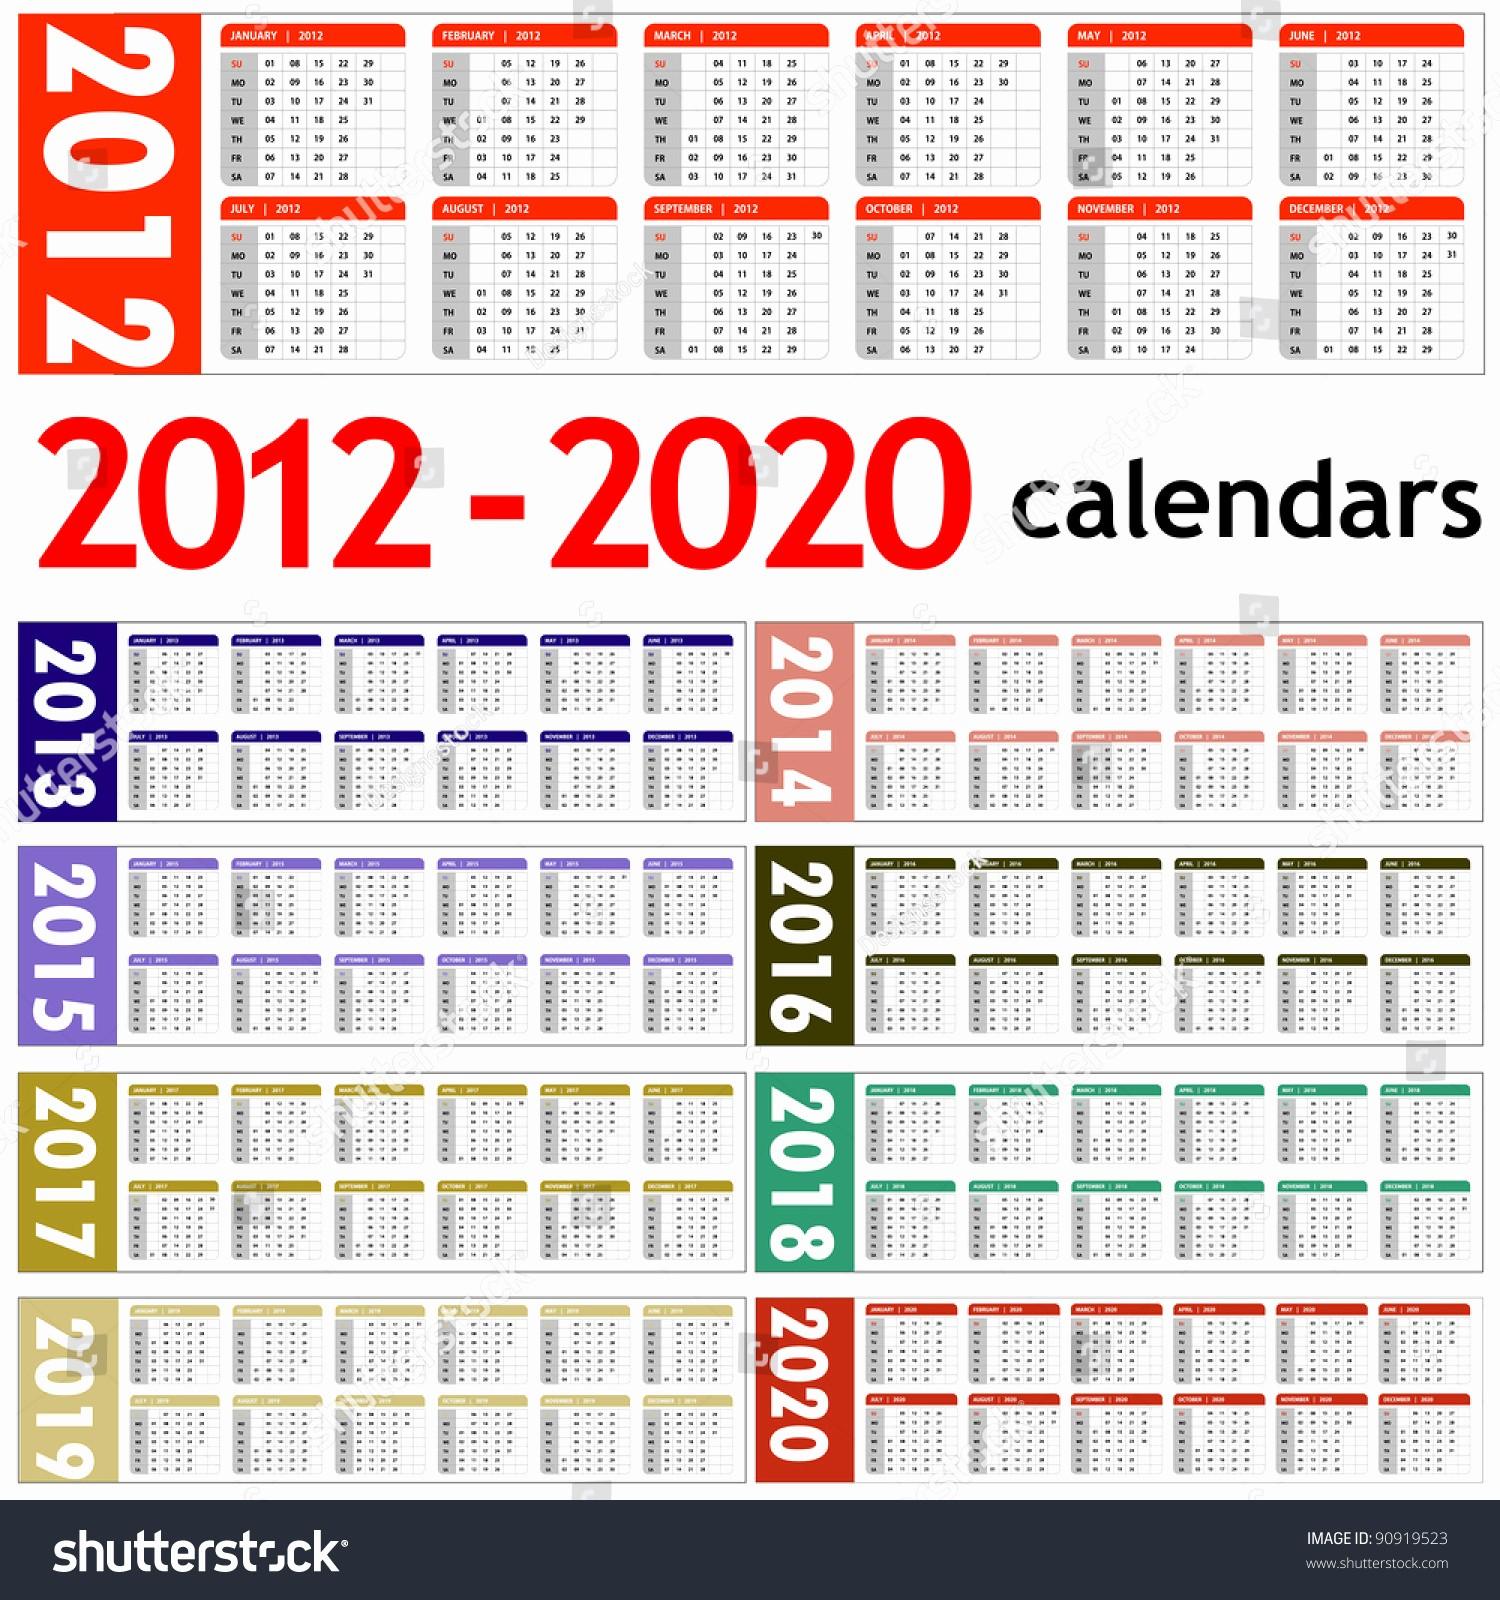 nrf 2019 2020 calendar nrf 2019 2020 calendar new year 2012 2013 2014 2015 2016 2017 2018 2019